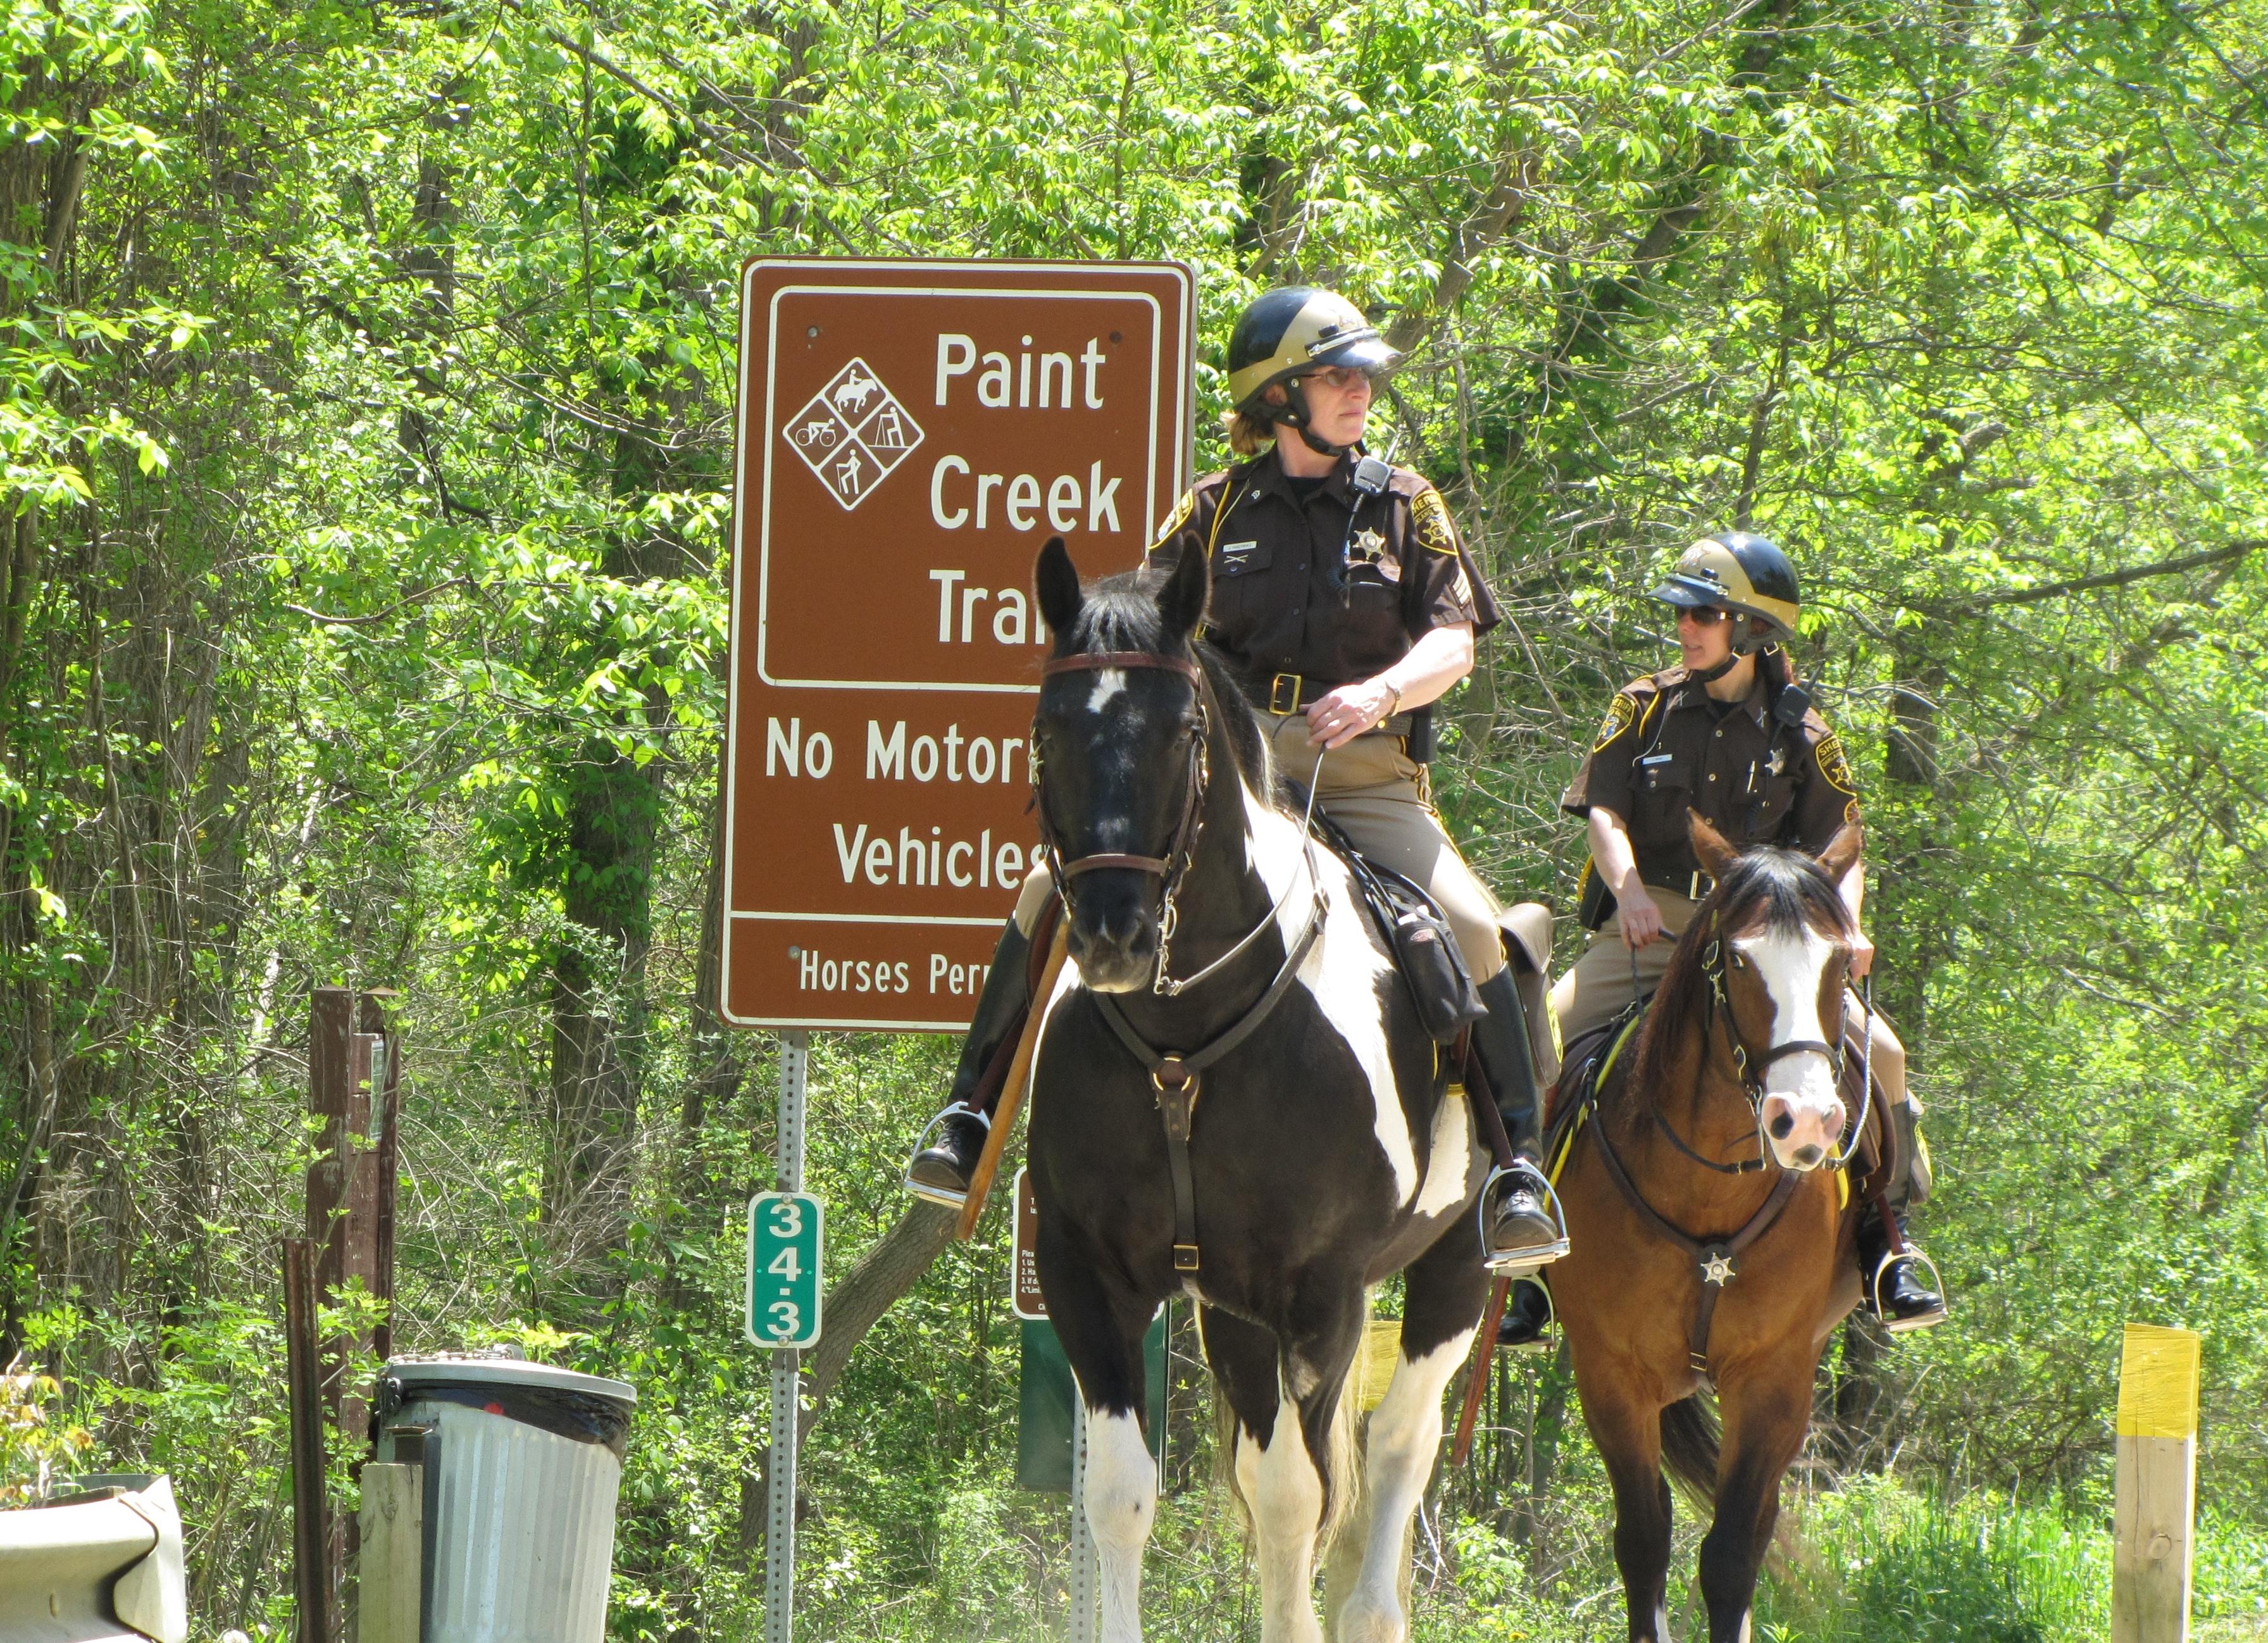 Oakland Sheriff Deputies patrolling Paint Creek Trail.